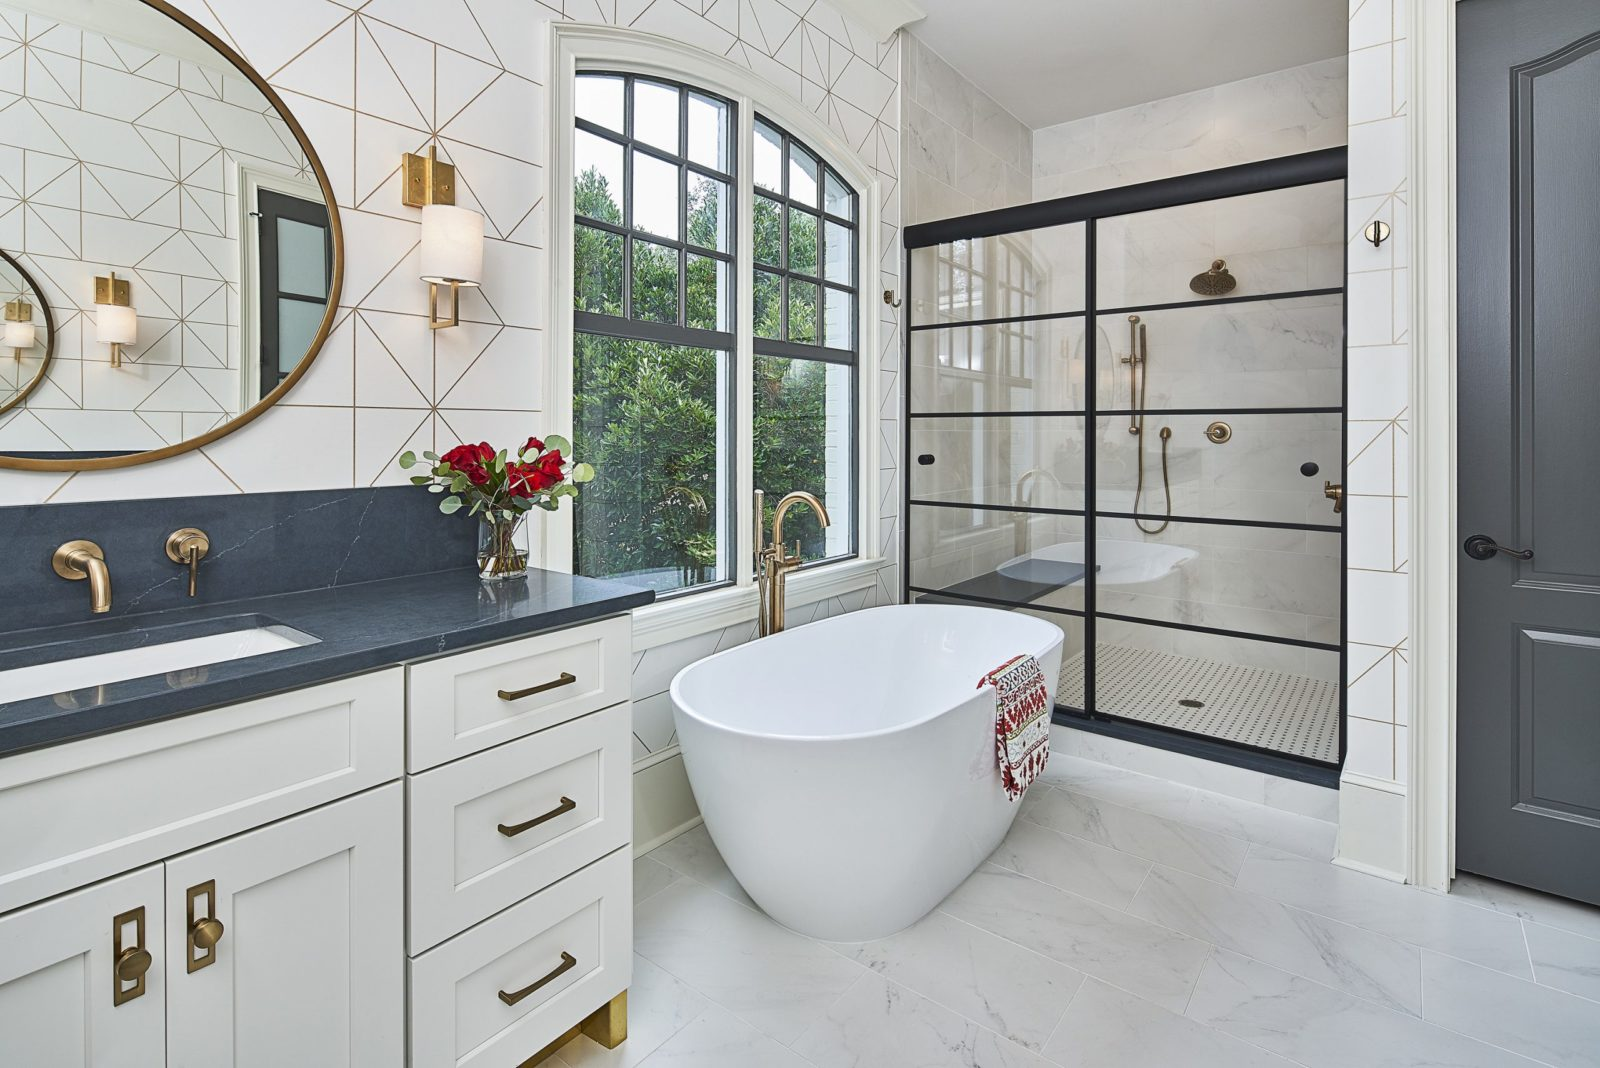 Black framed sliding shower door